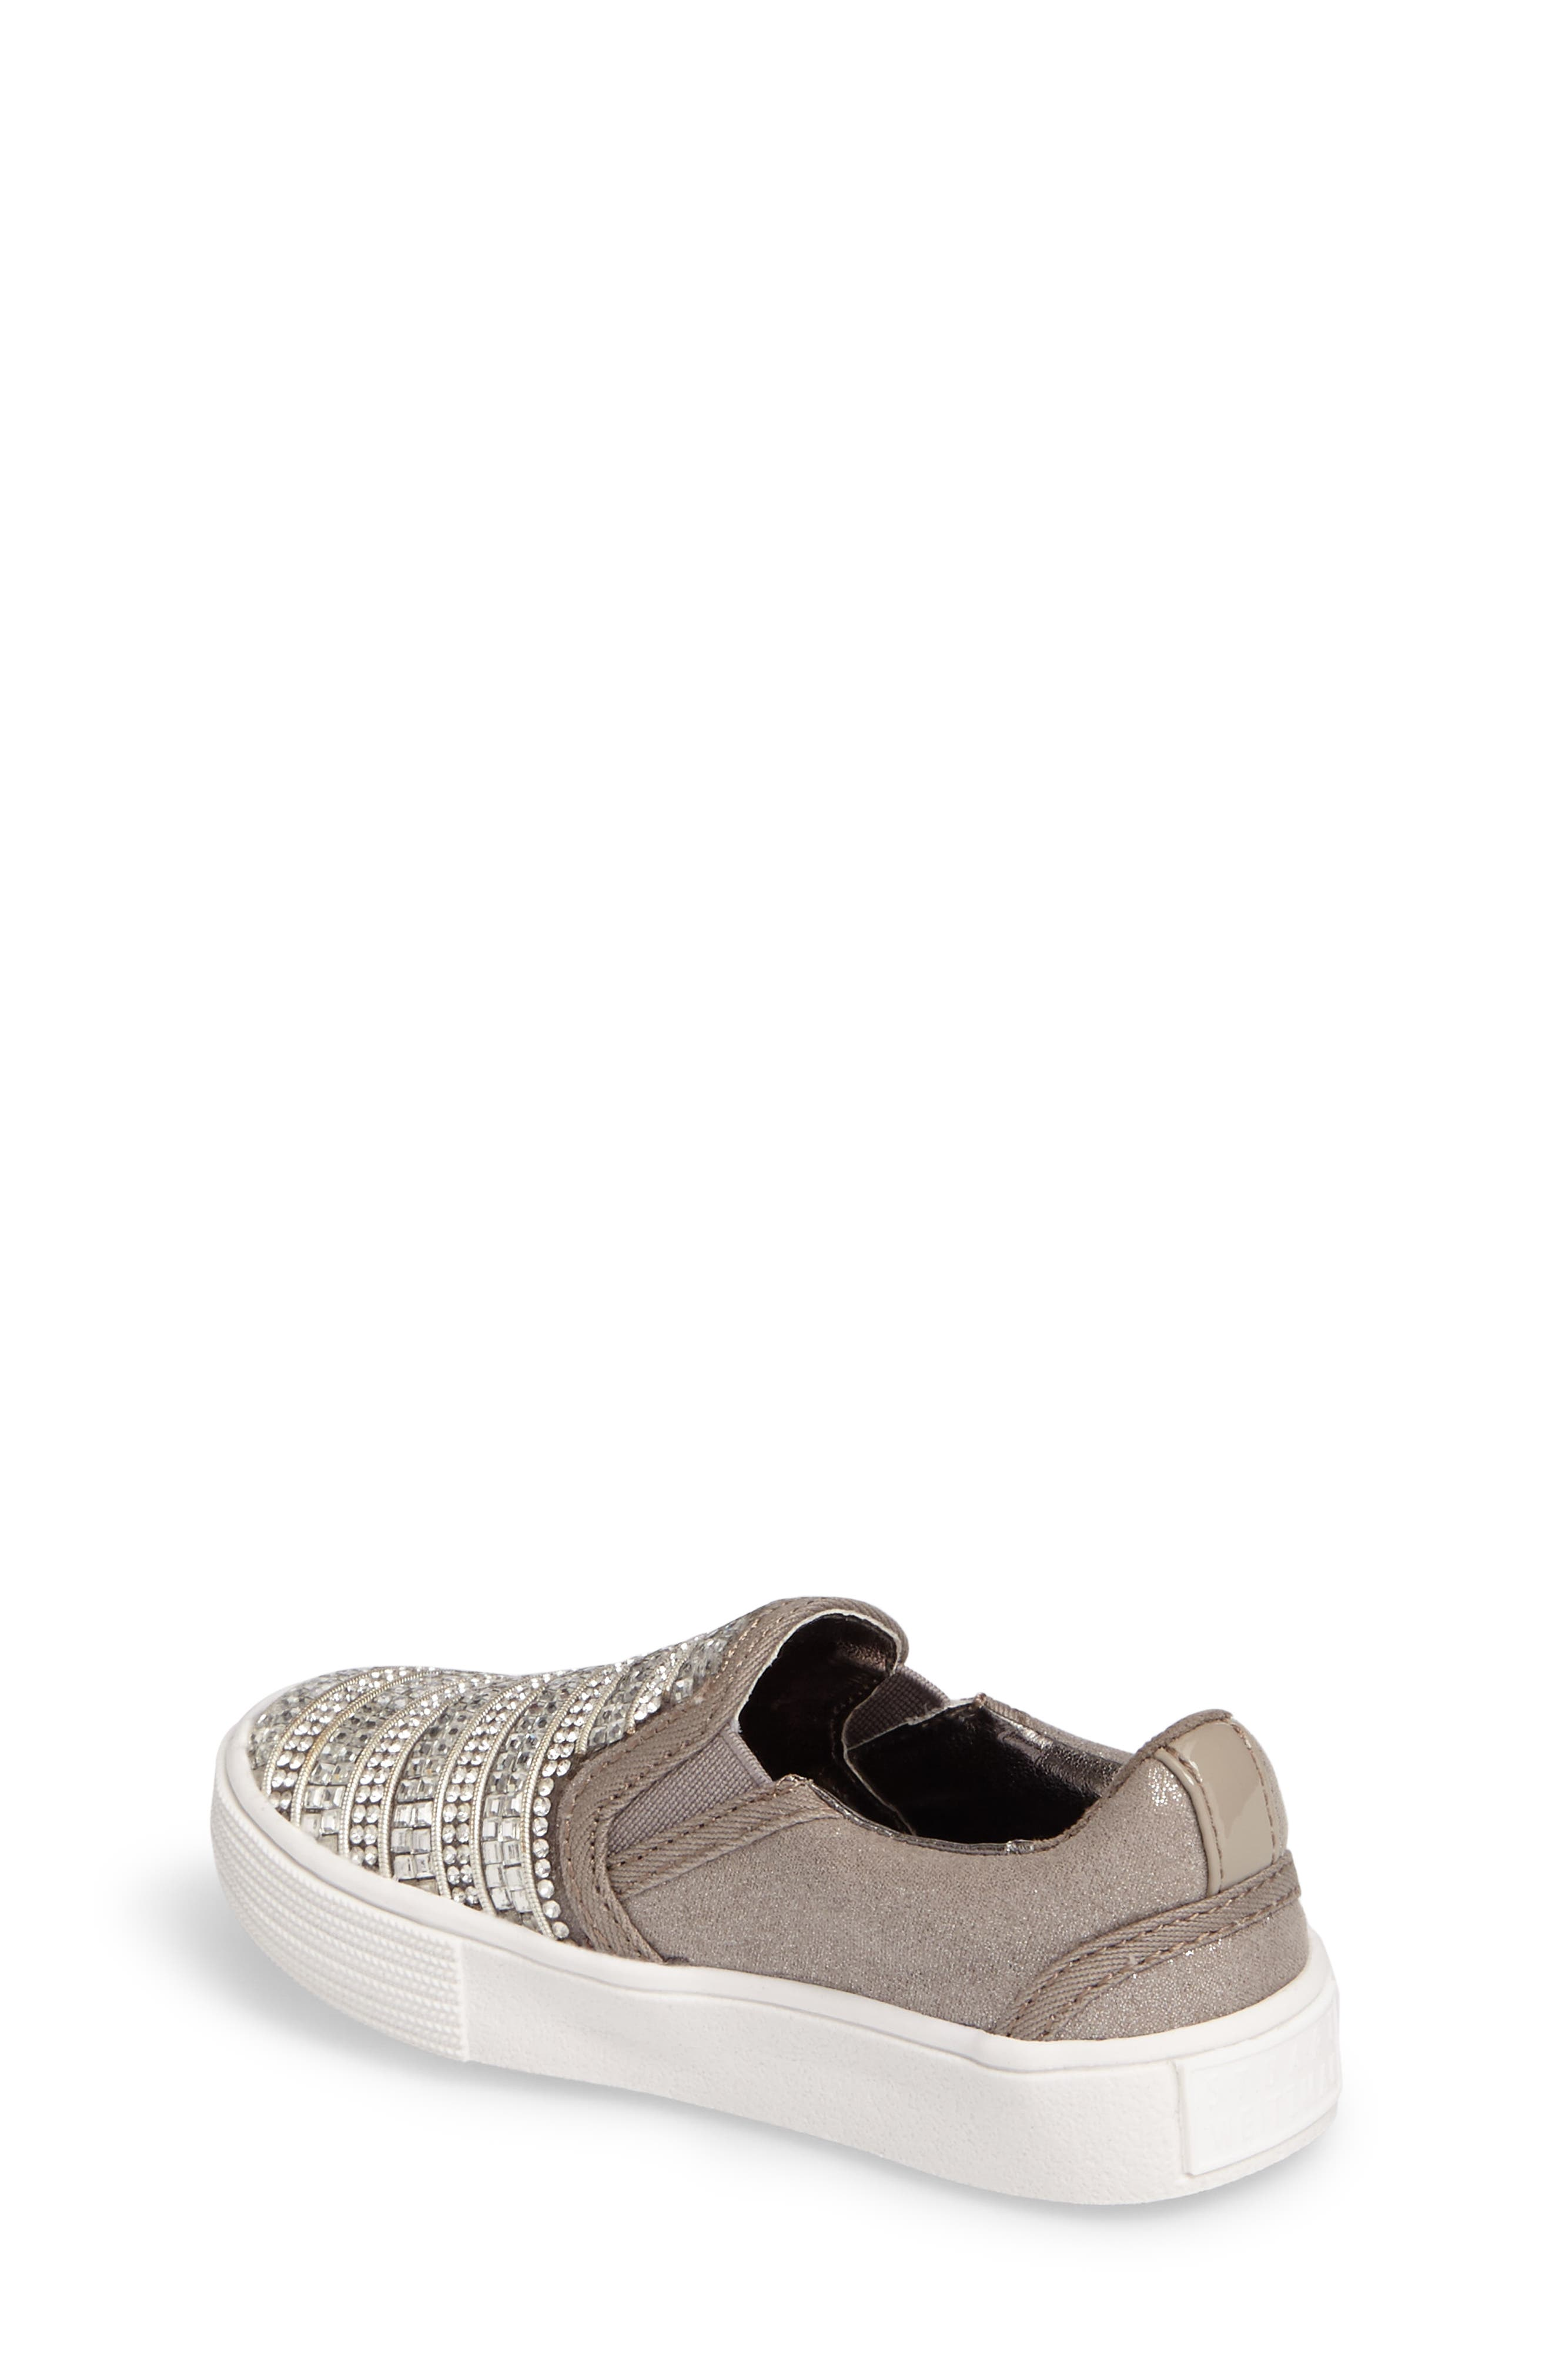 Alternate Image 2  - Stuart Weitzman Vance Glitz Embellished Slip-On Sneaker (Walker & Toddler)